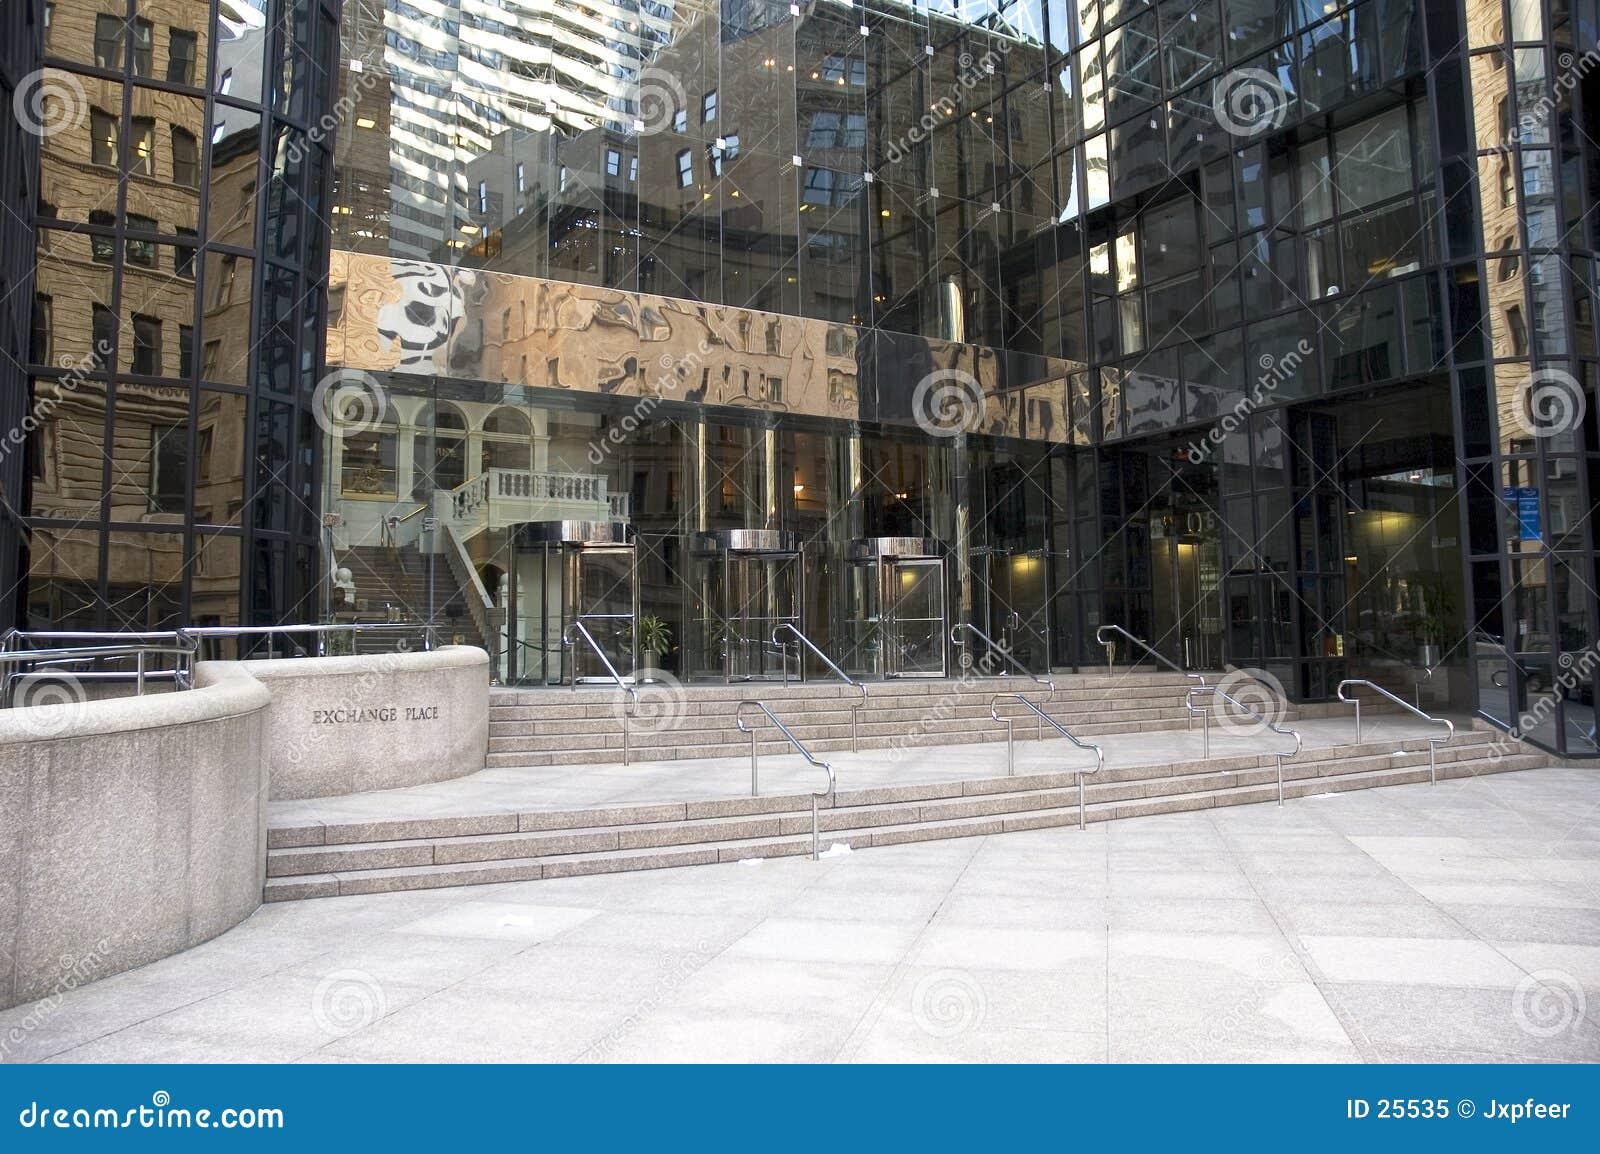 Corporate entrance